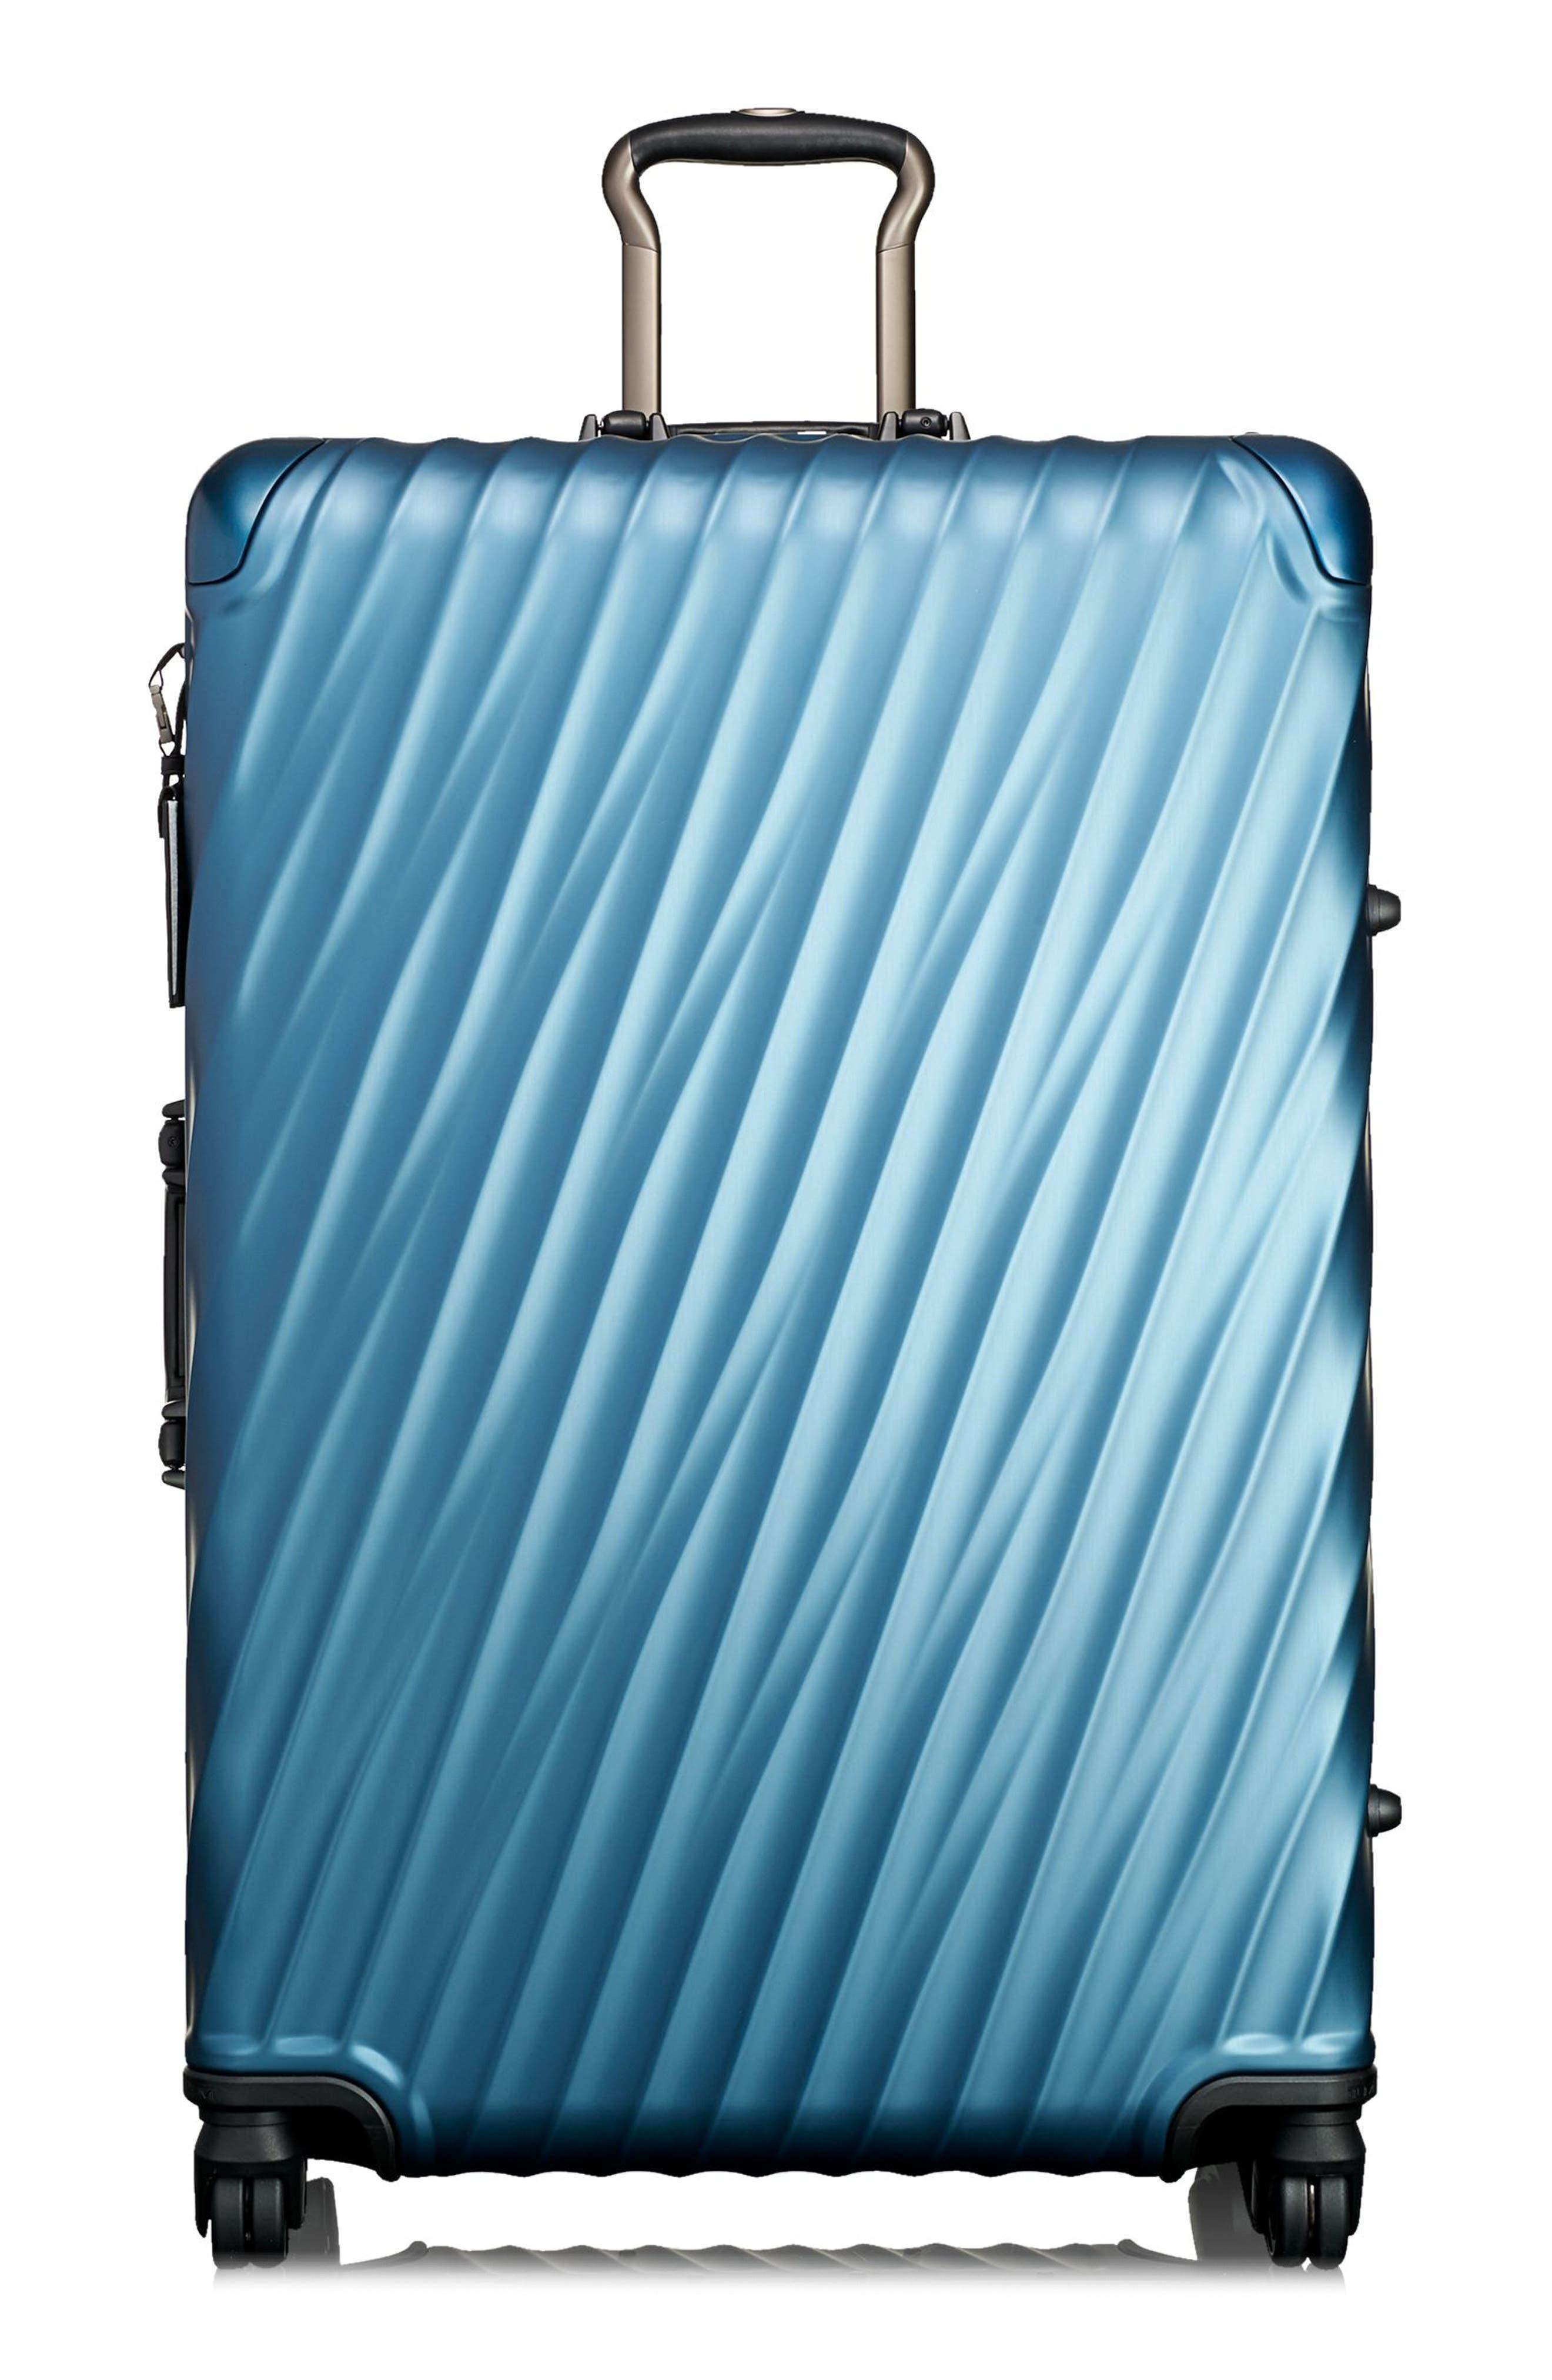 Main Image - Tumi 19 Degree Extended Trip Wheeled Aluminum Packing Case